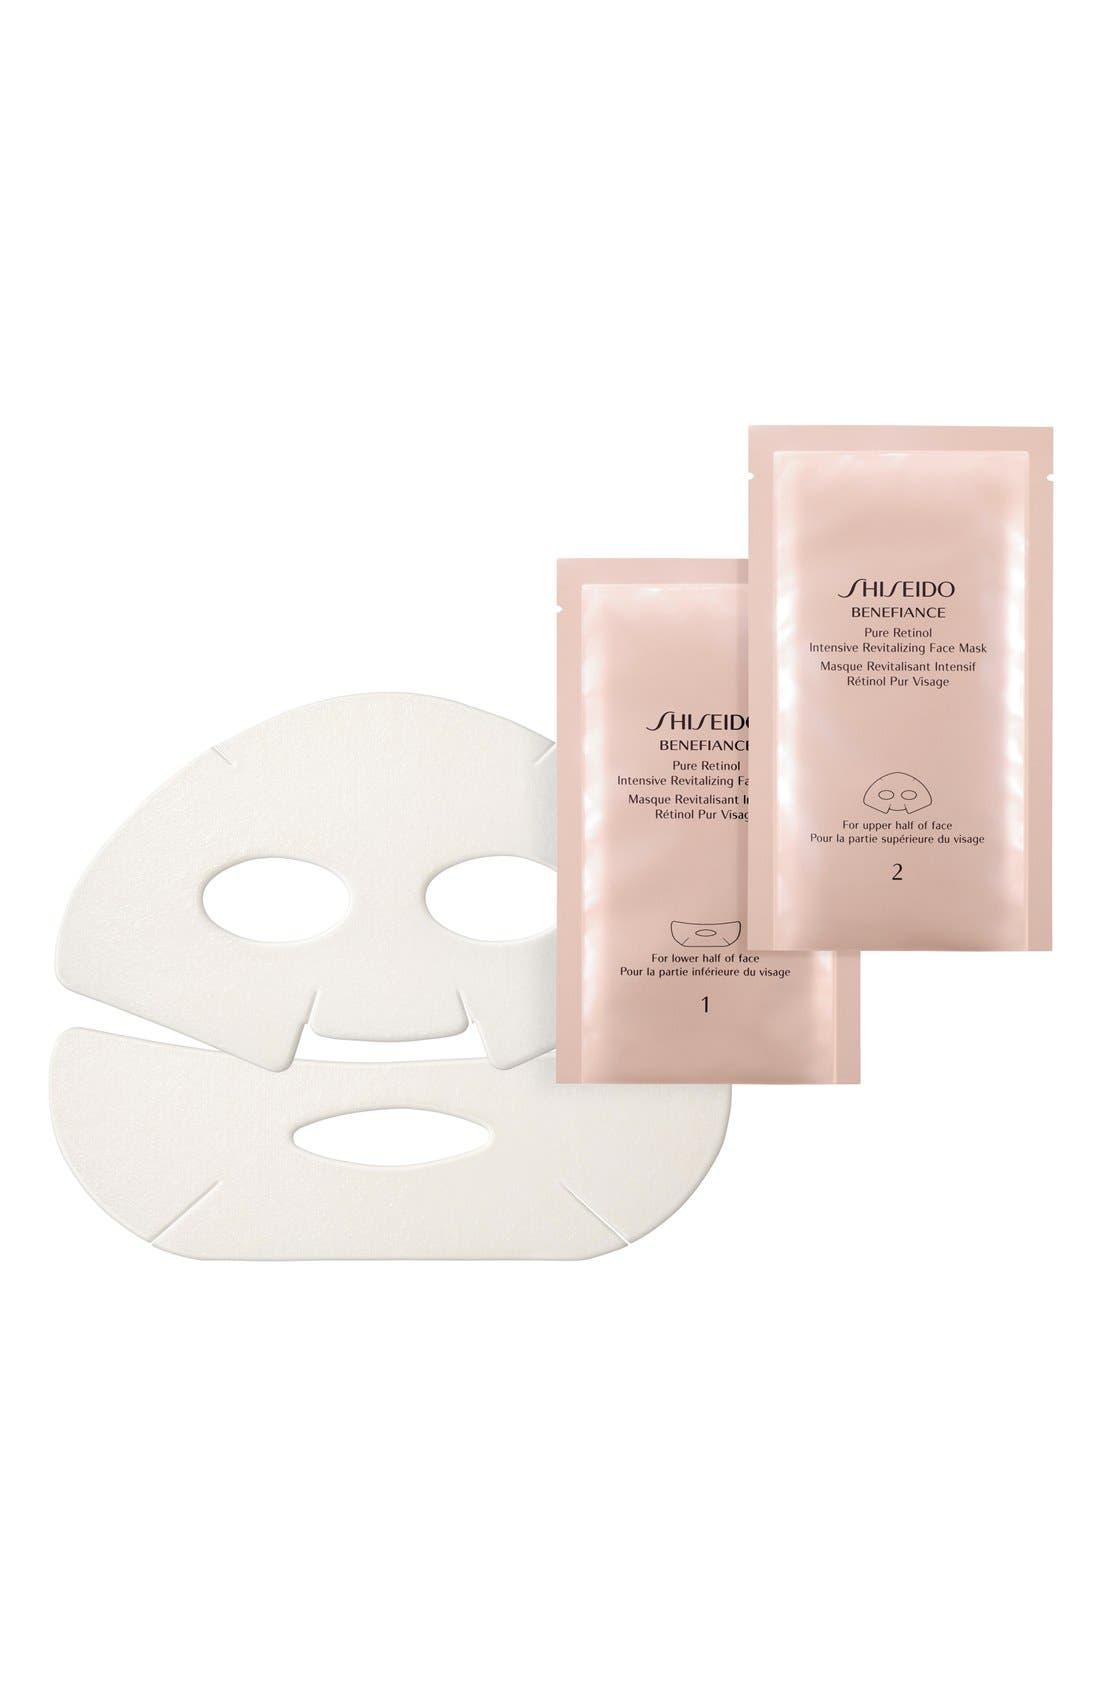 Shiseido 'Benefiance' Pure Retinol Intensive Revitalizing Face Mask